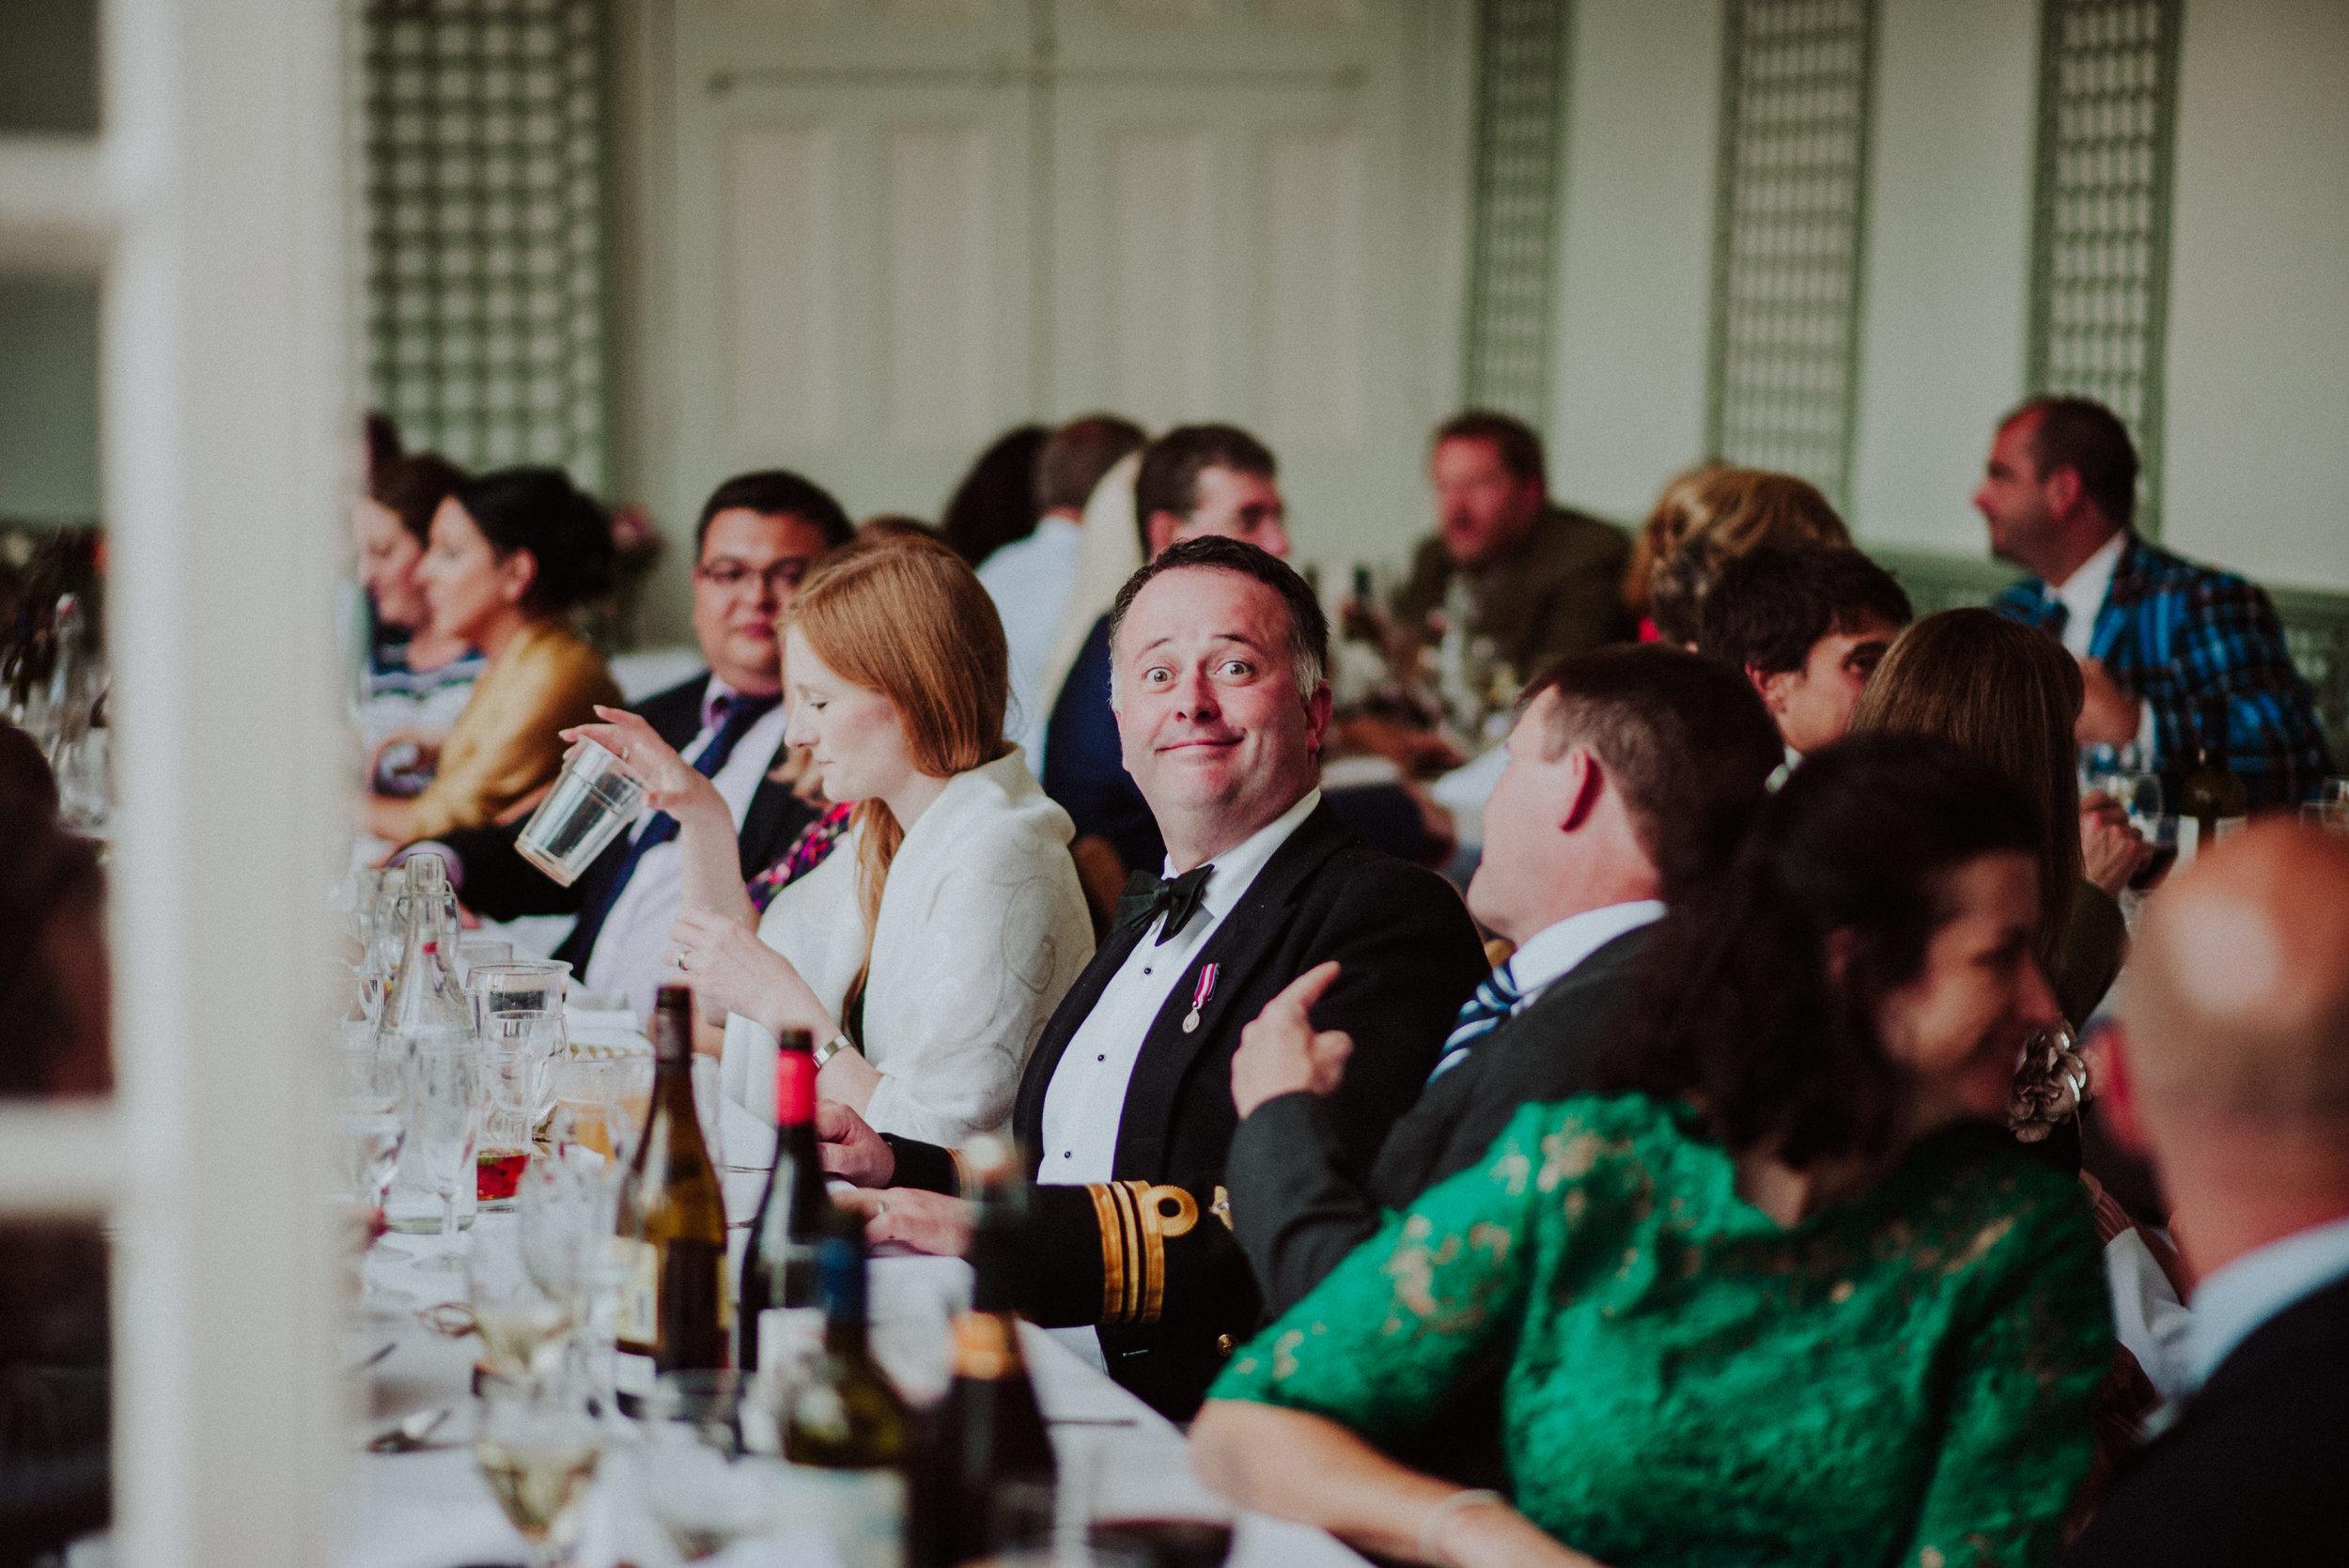 port-eliot-wedding-photographer-65.jpg